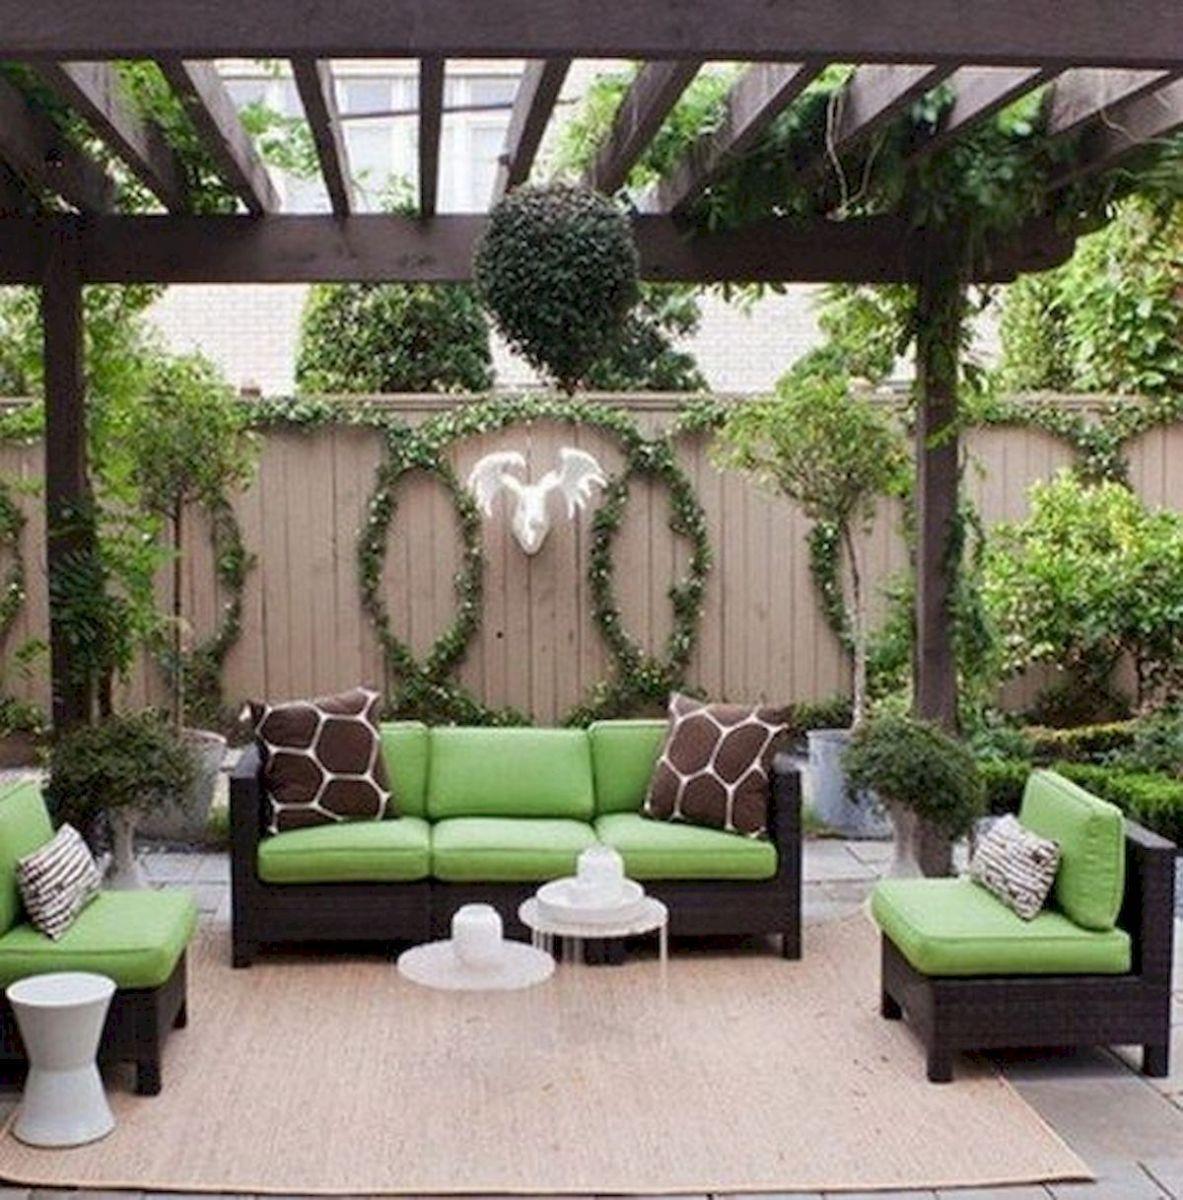 50 Awesome DIY Hanging Plants Ideas For Modern Backyard Garden (46)